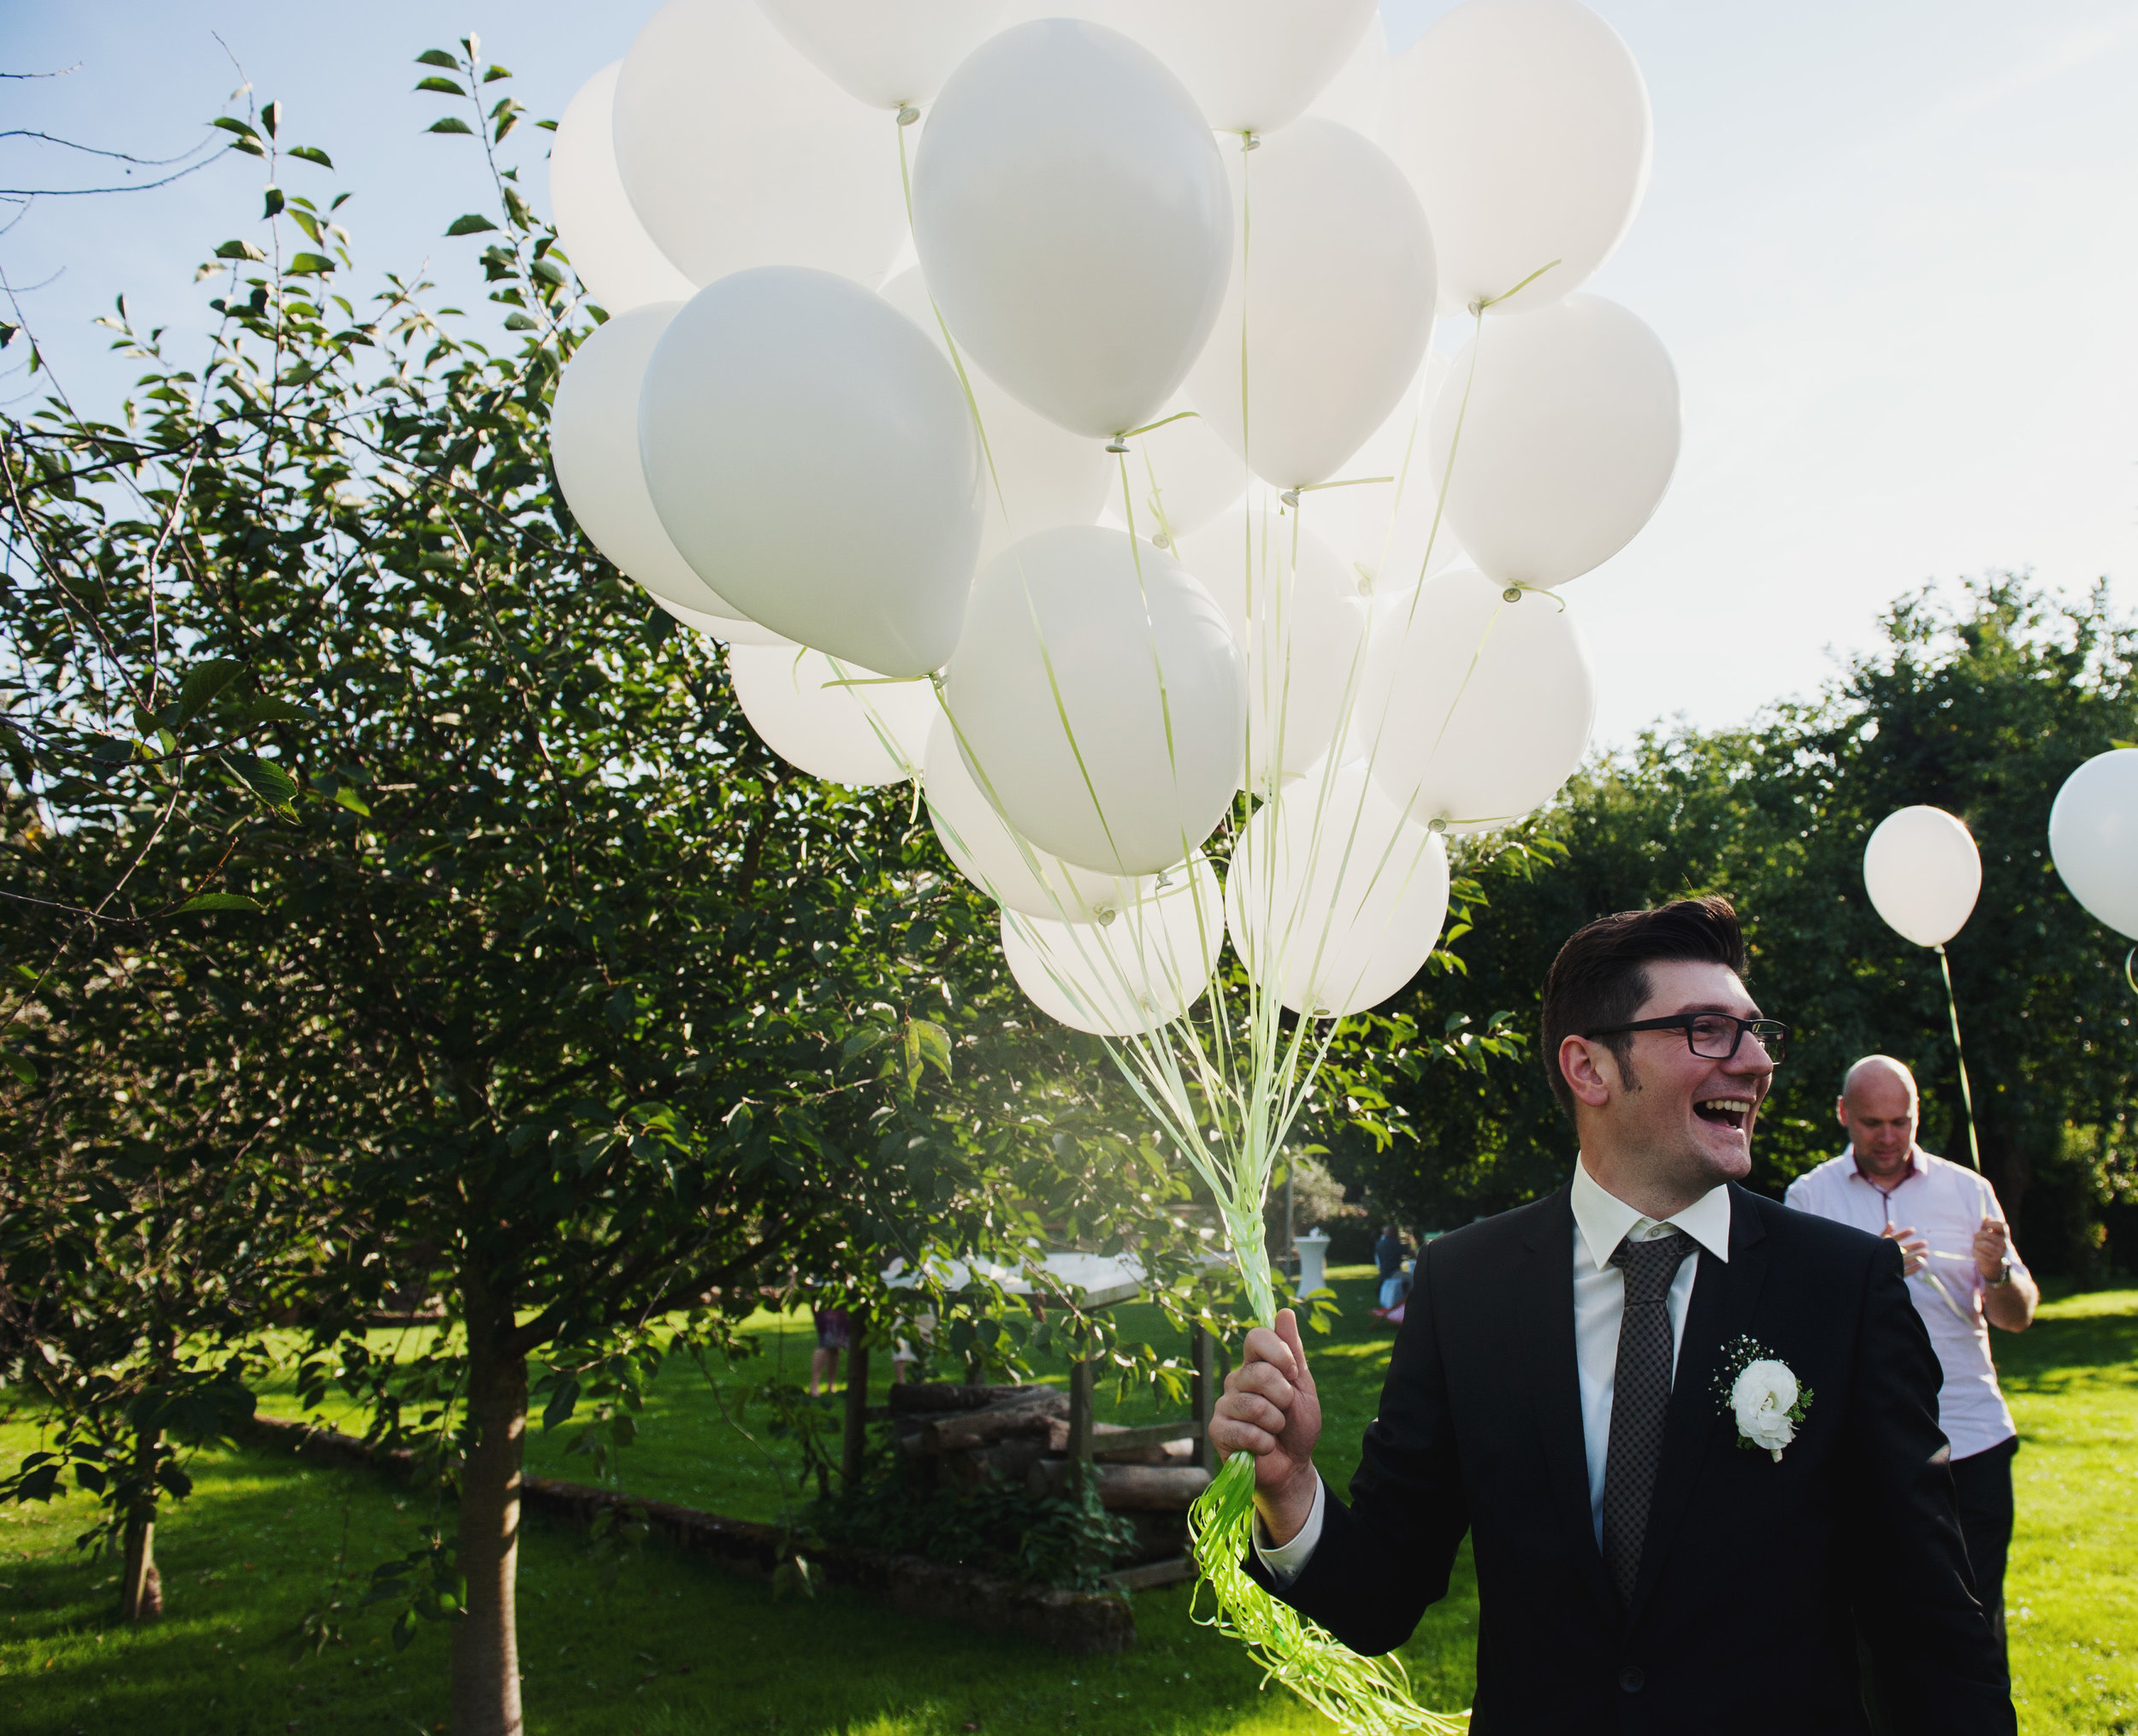 ballons-hochzeit-bräutigam.jpg